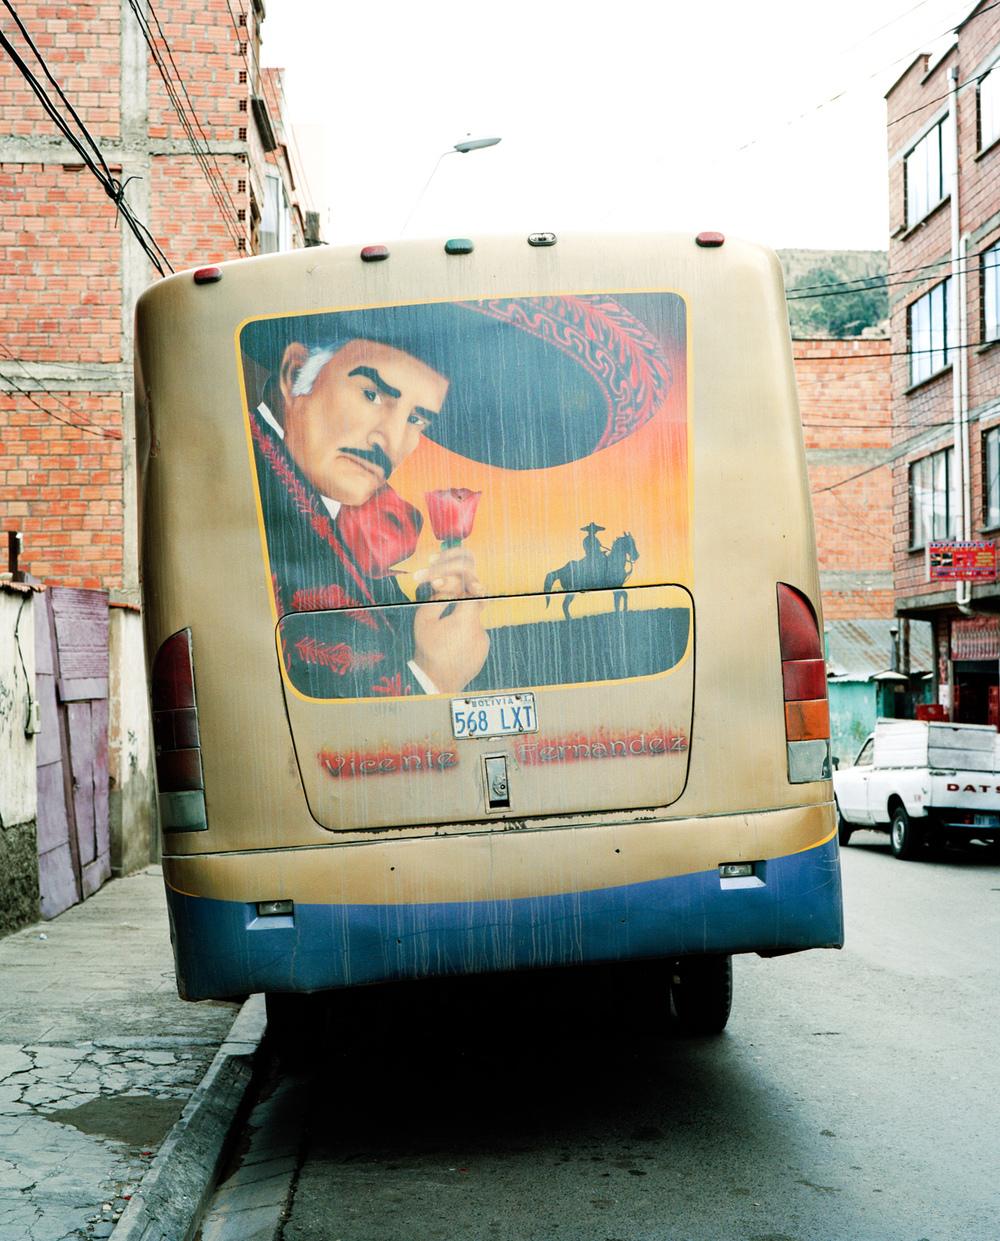 Daniel_Hofer_Bolivian_Busses_199_11_1550PX_WEB.jpg